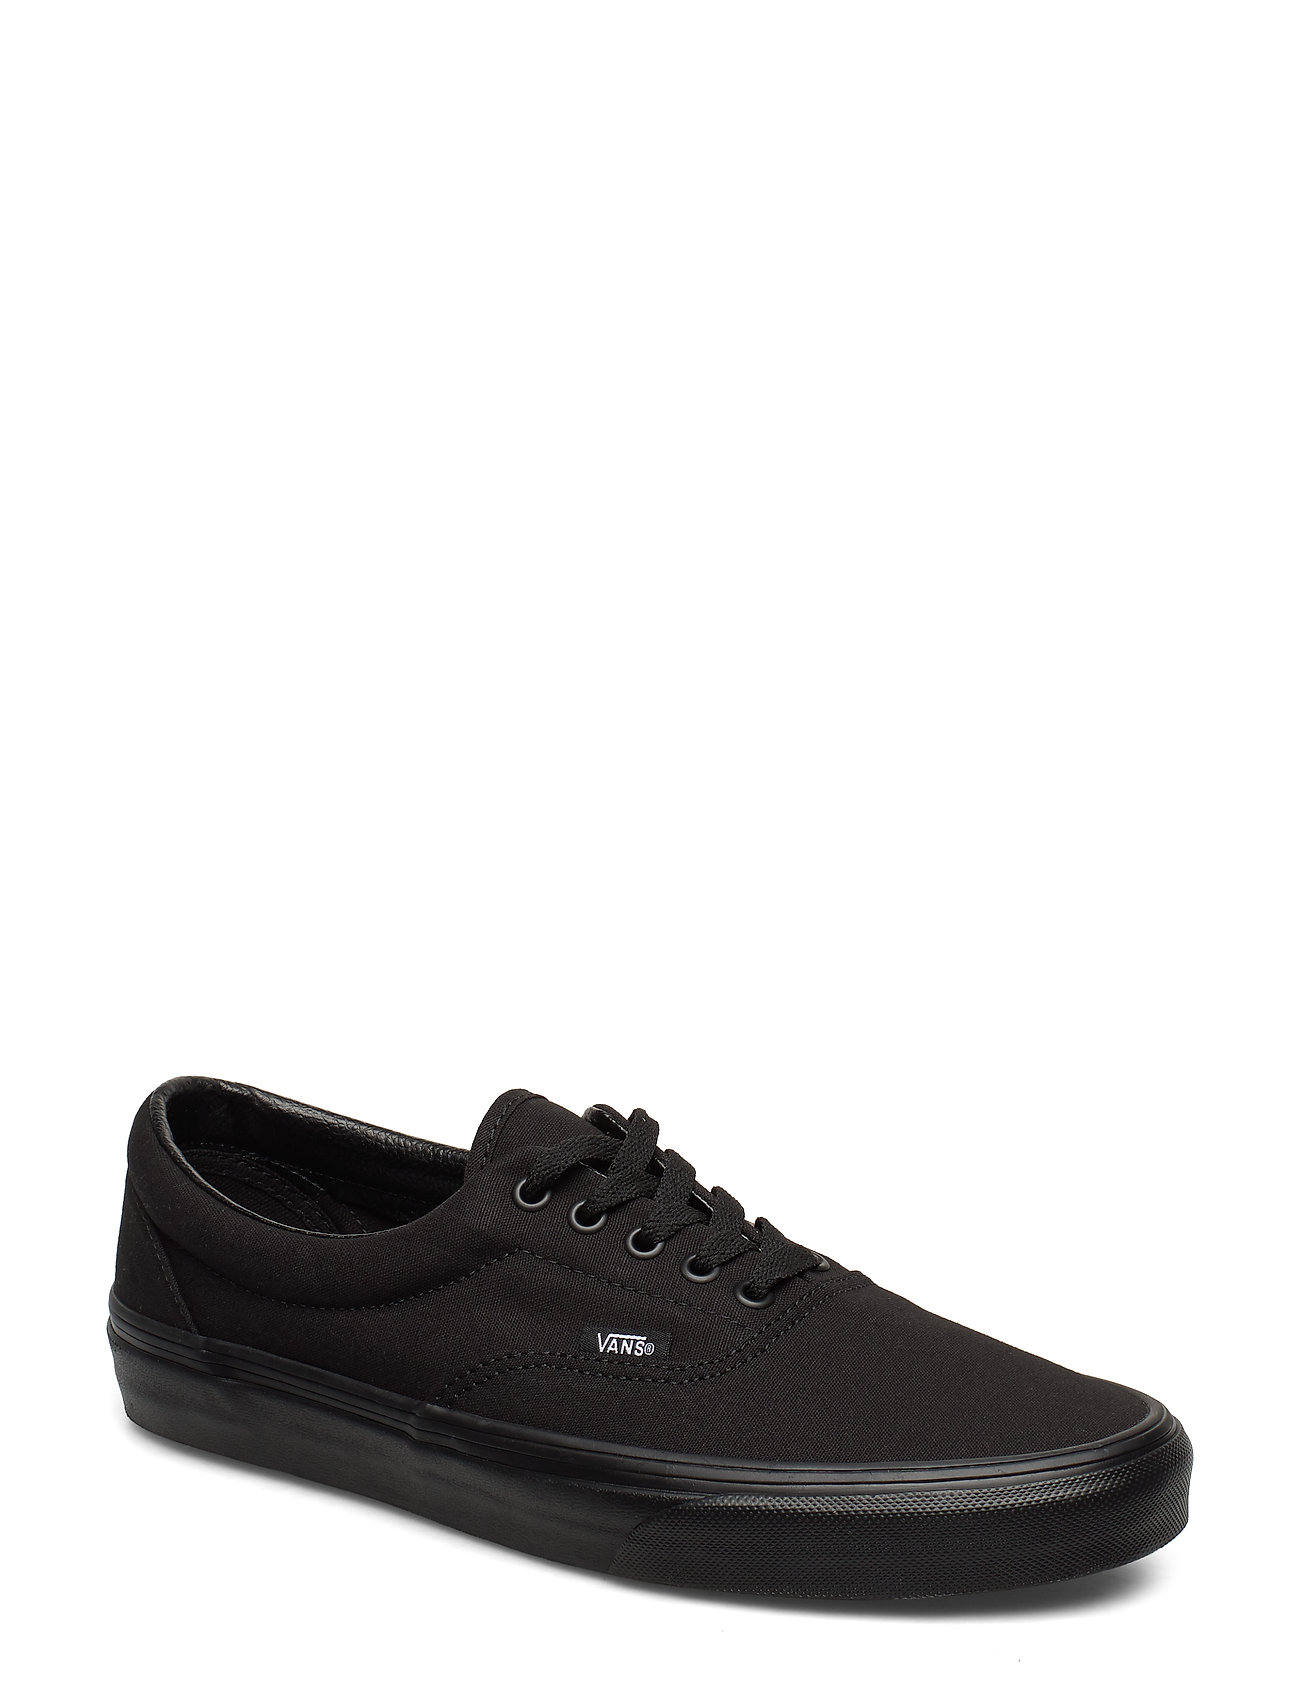 Image of Full Patch Low-top Sneakers Sort VANS (3384768837)